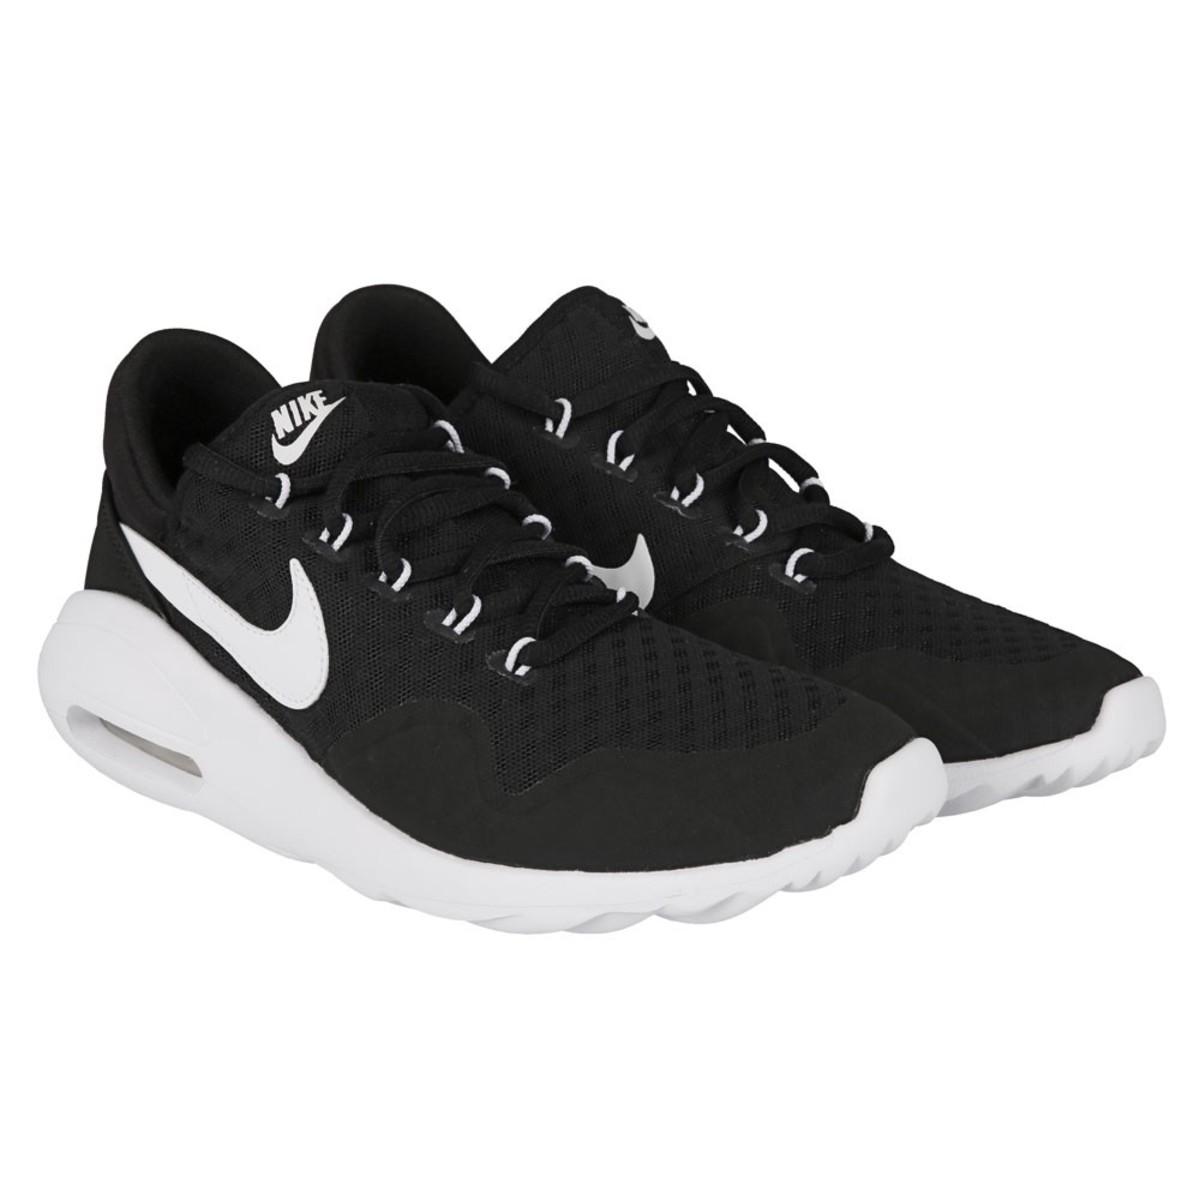 Bild 4 von Nike Air Max Sasha (Damen), Sneaker, schwarz 35,5